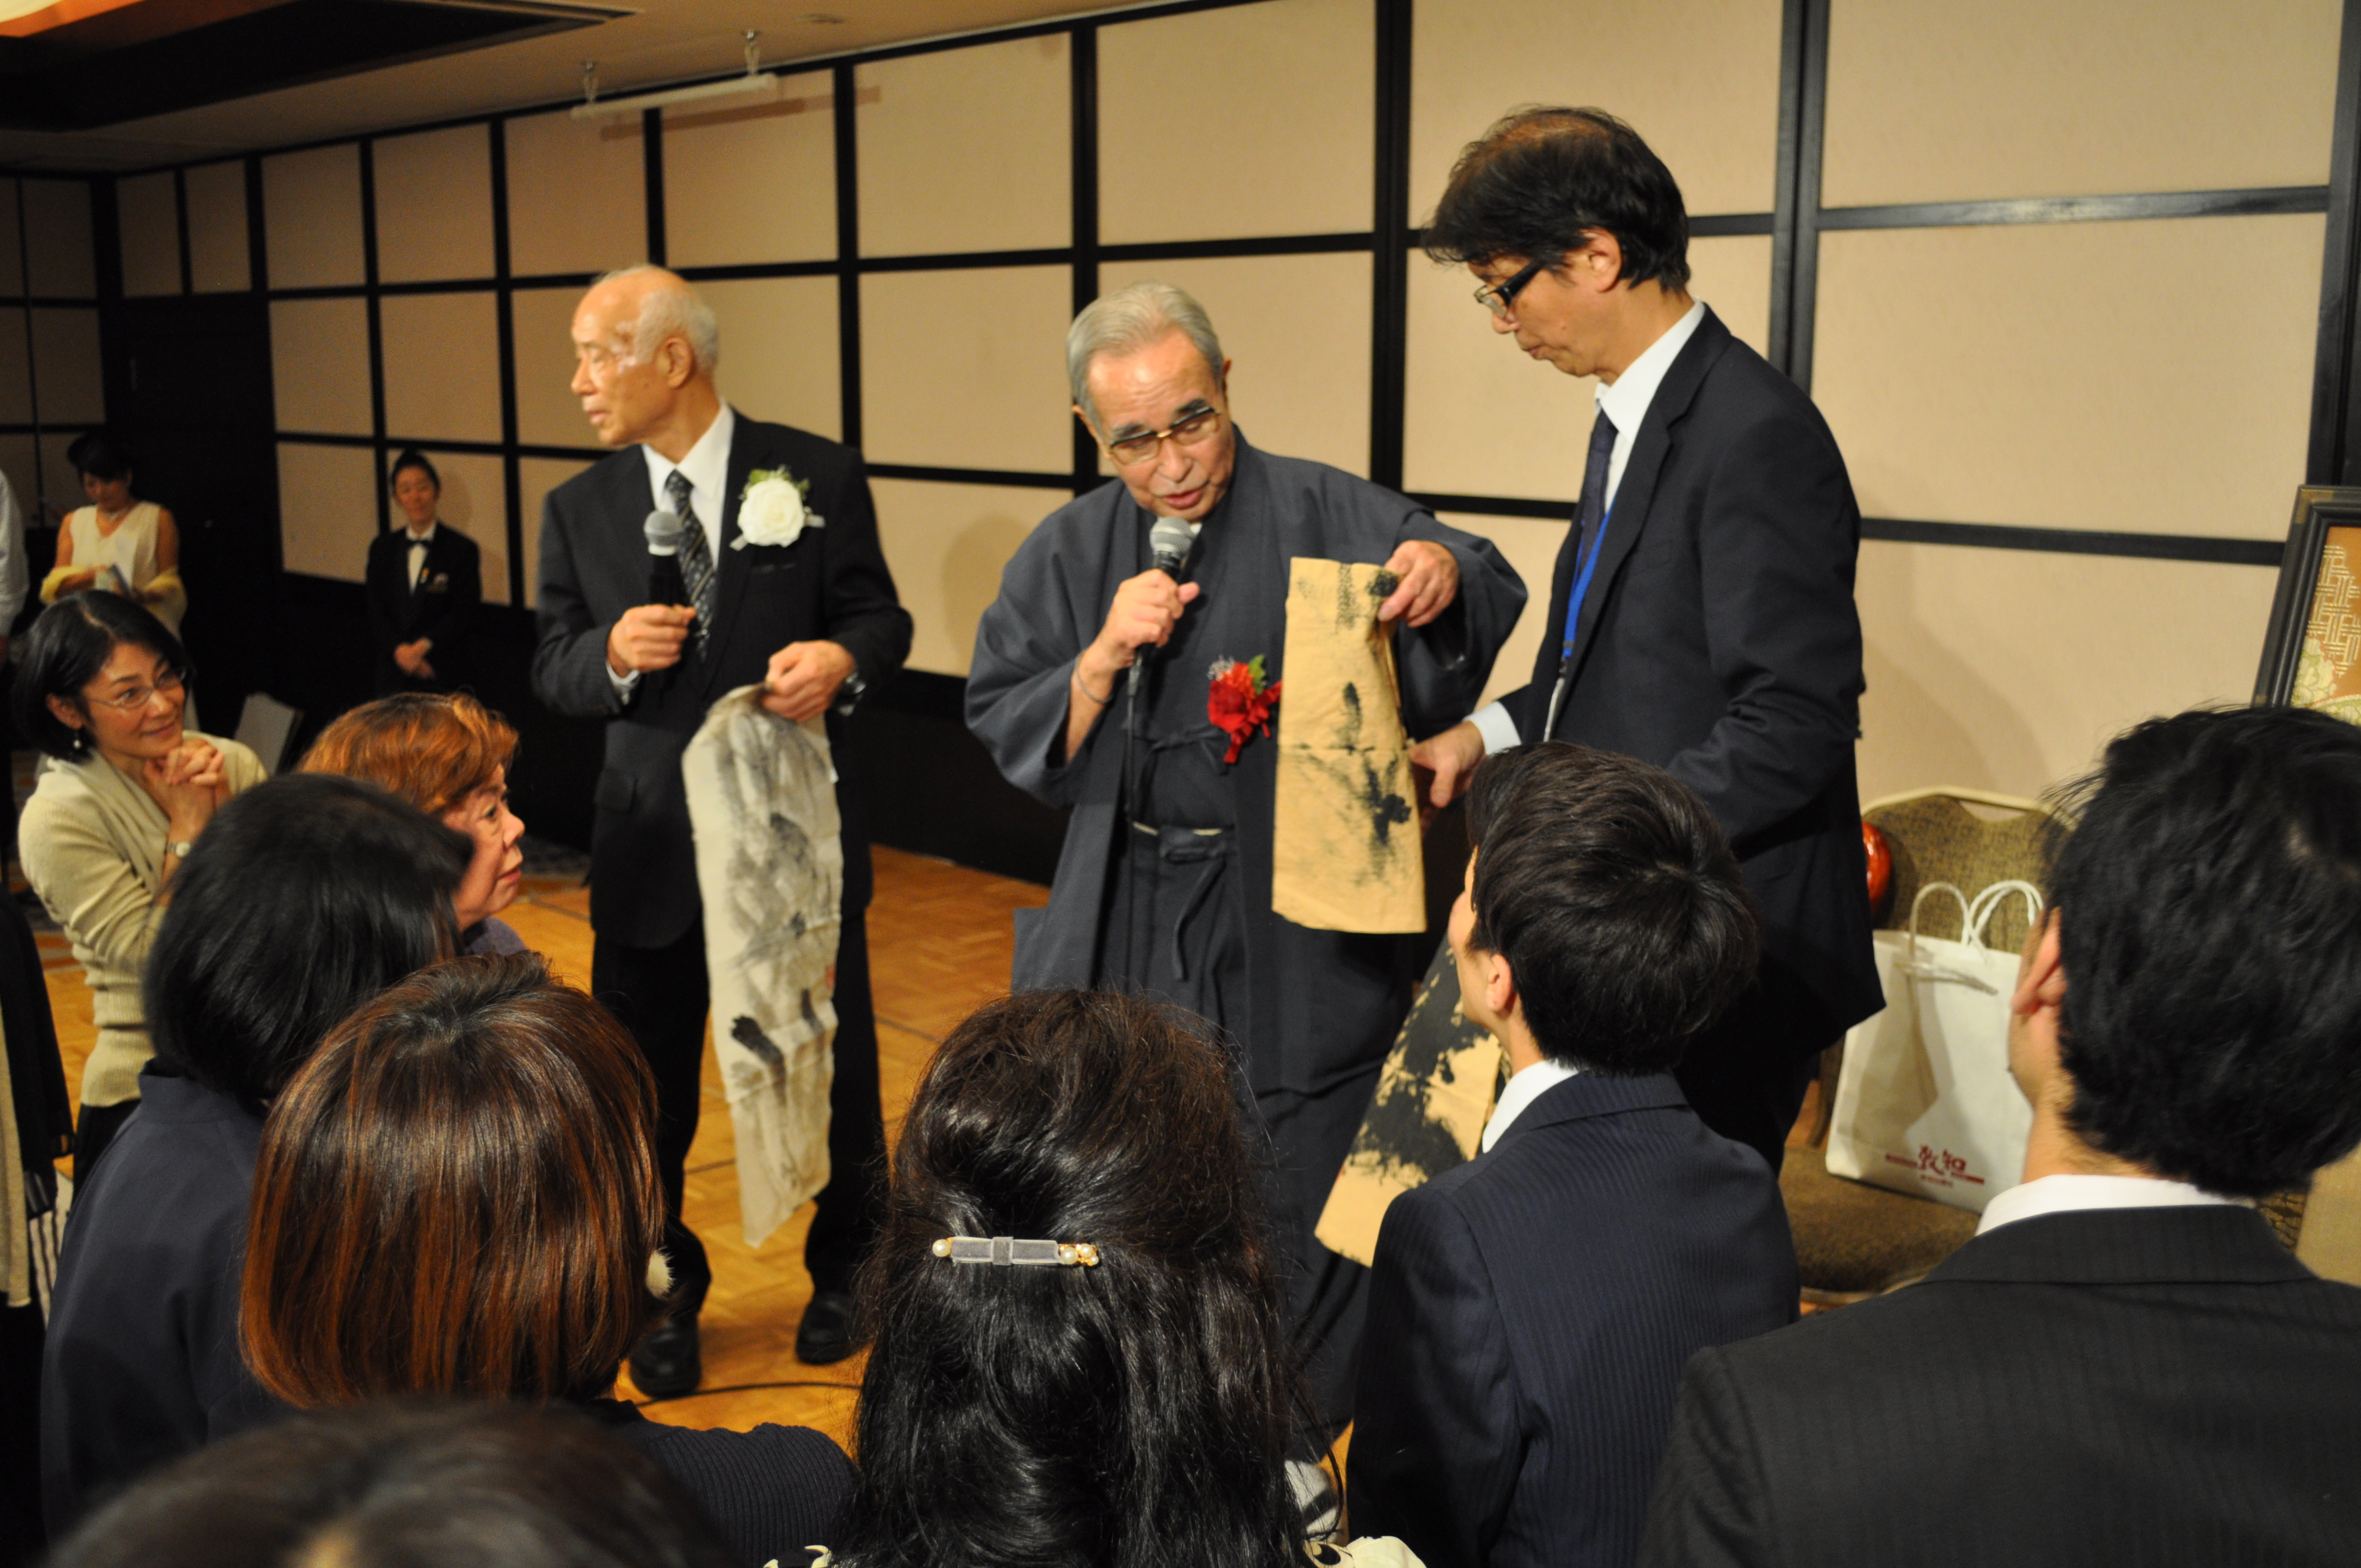 DSC 0592 - 第6回思風会全国大会2018in東京開催